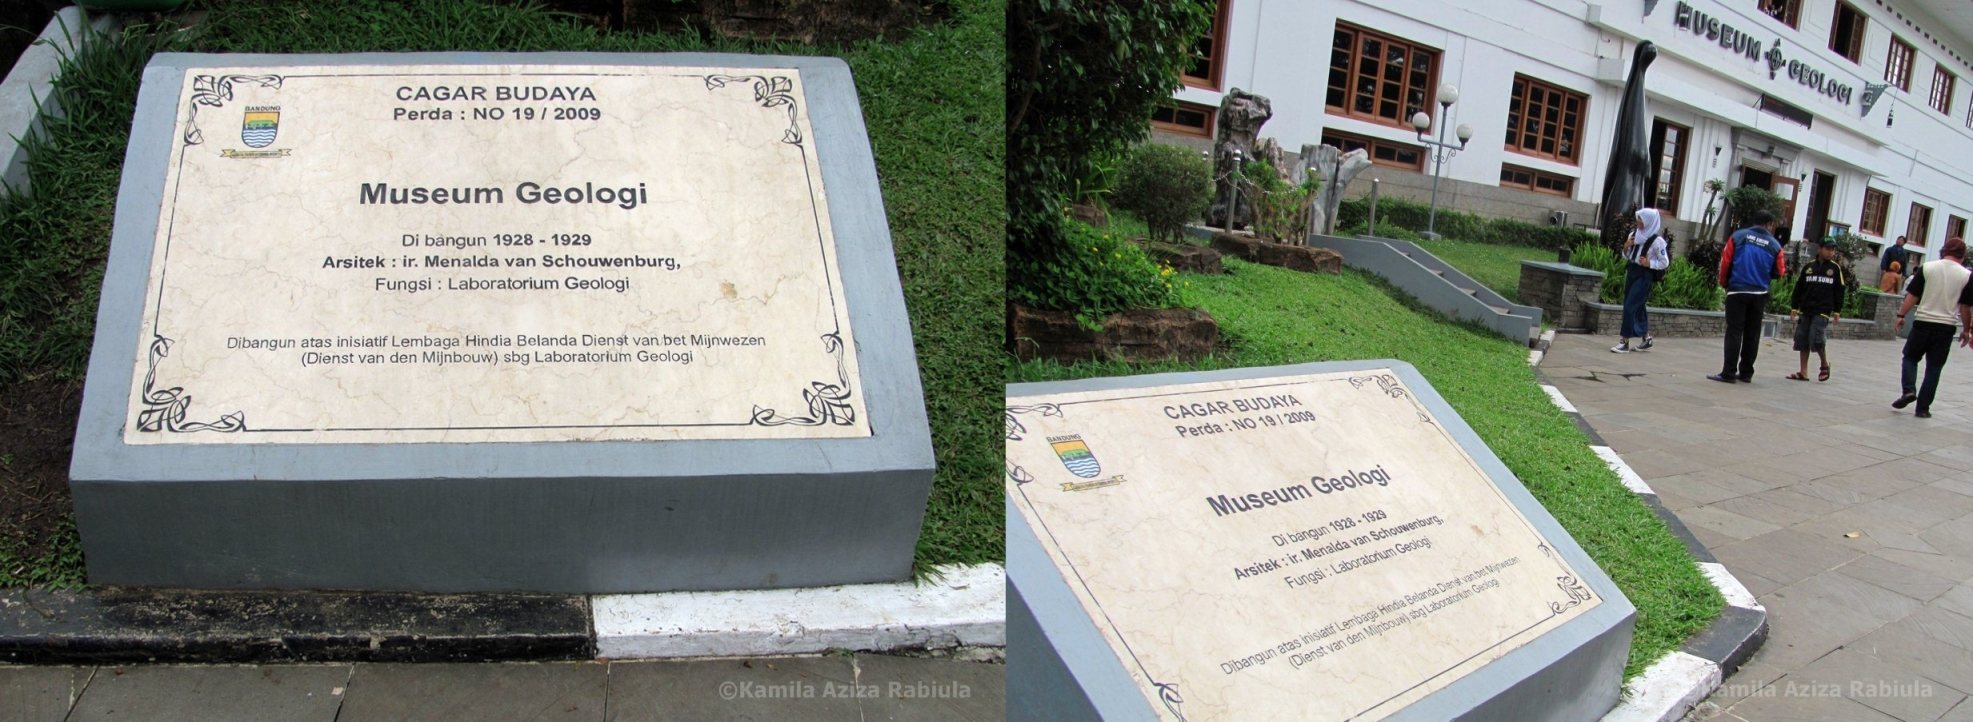 Museum Geologi Bandung Mind Forest Batu Peresmian Kab